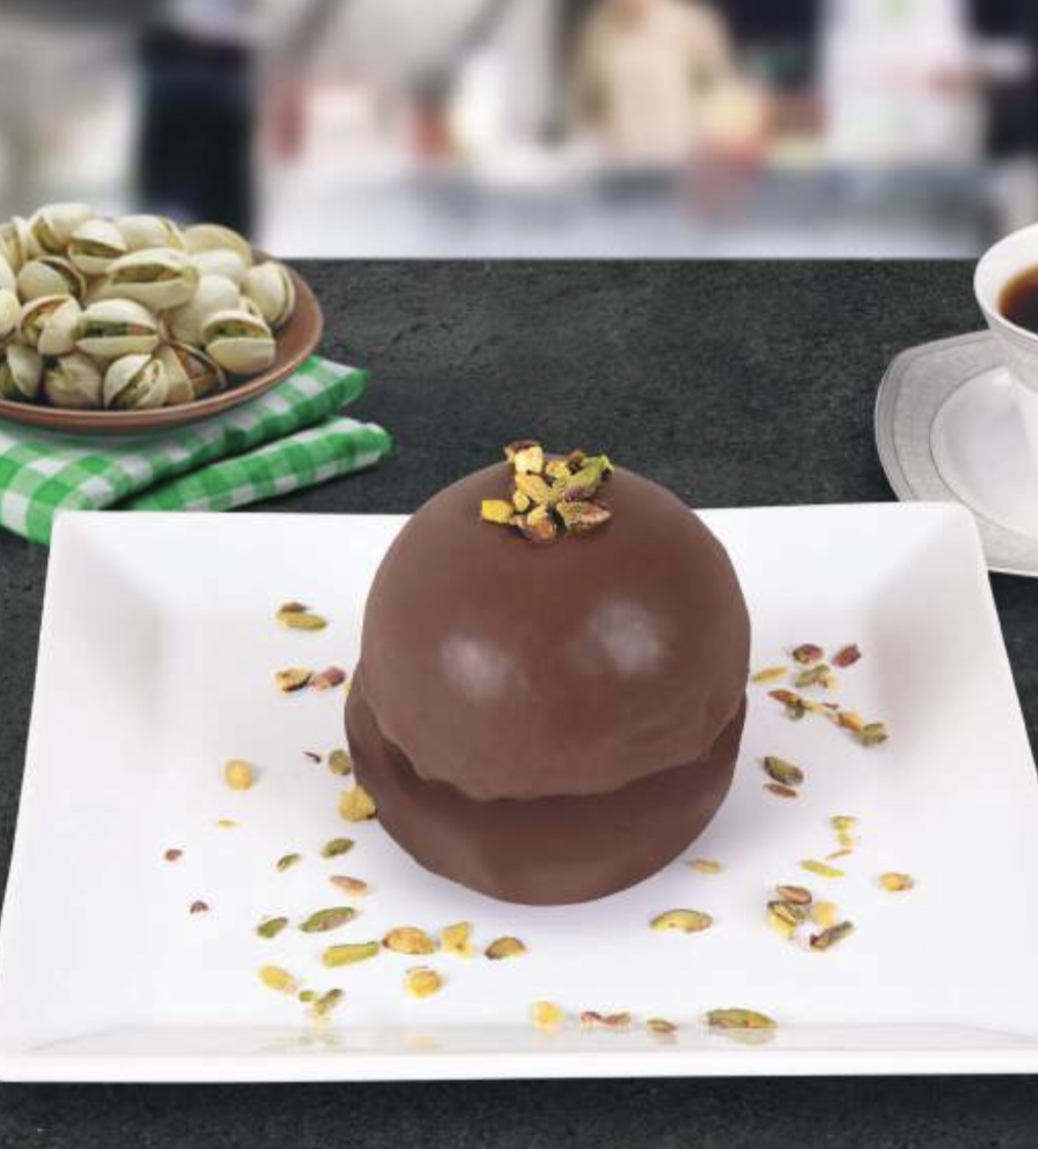 Loss Garden Cafe SİHİRLİ TOP